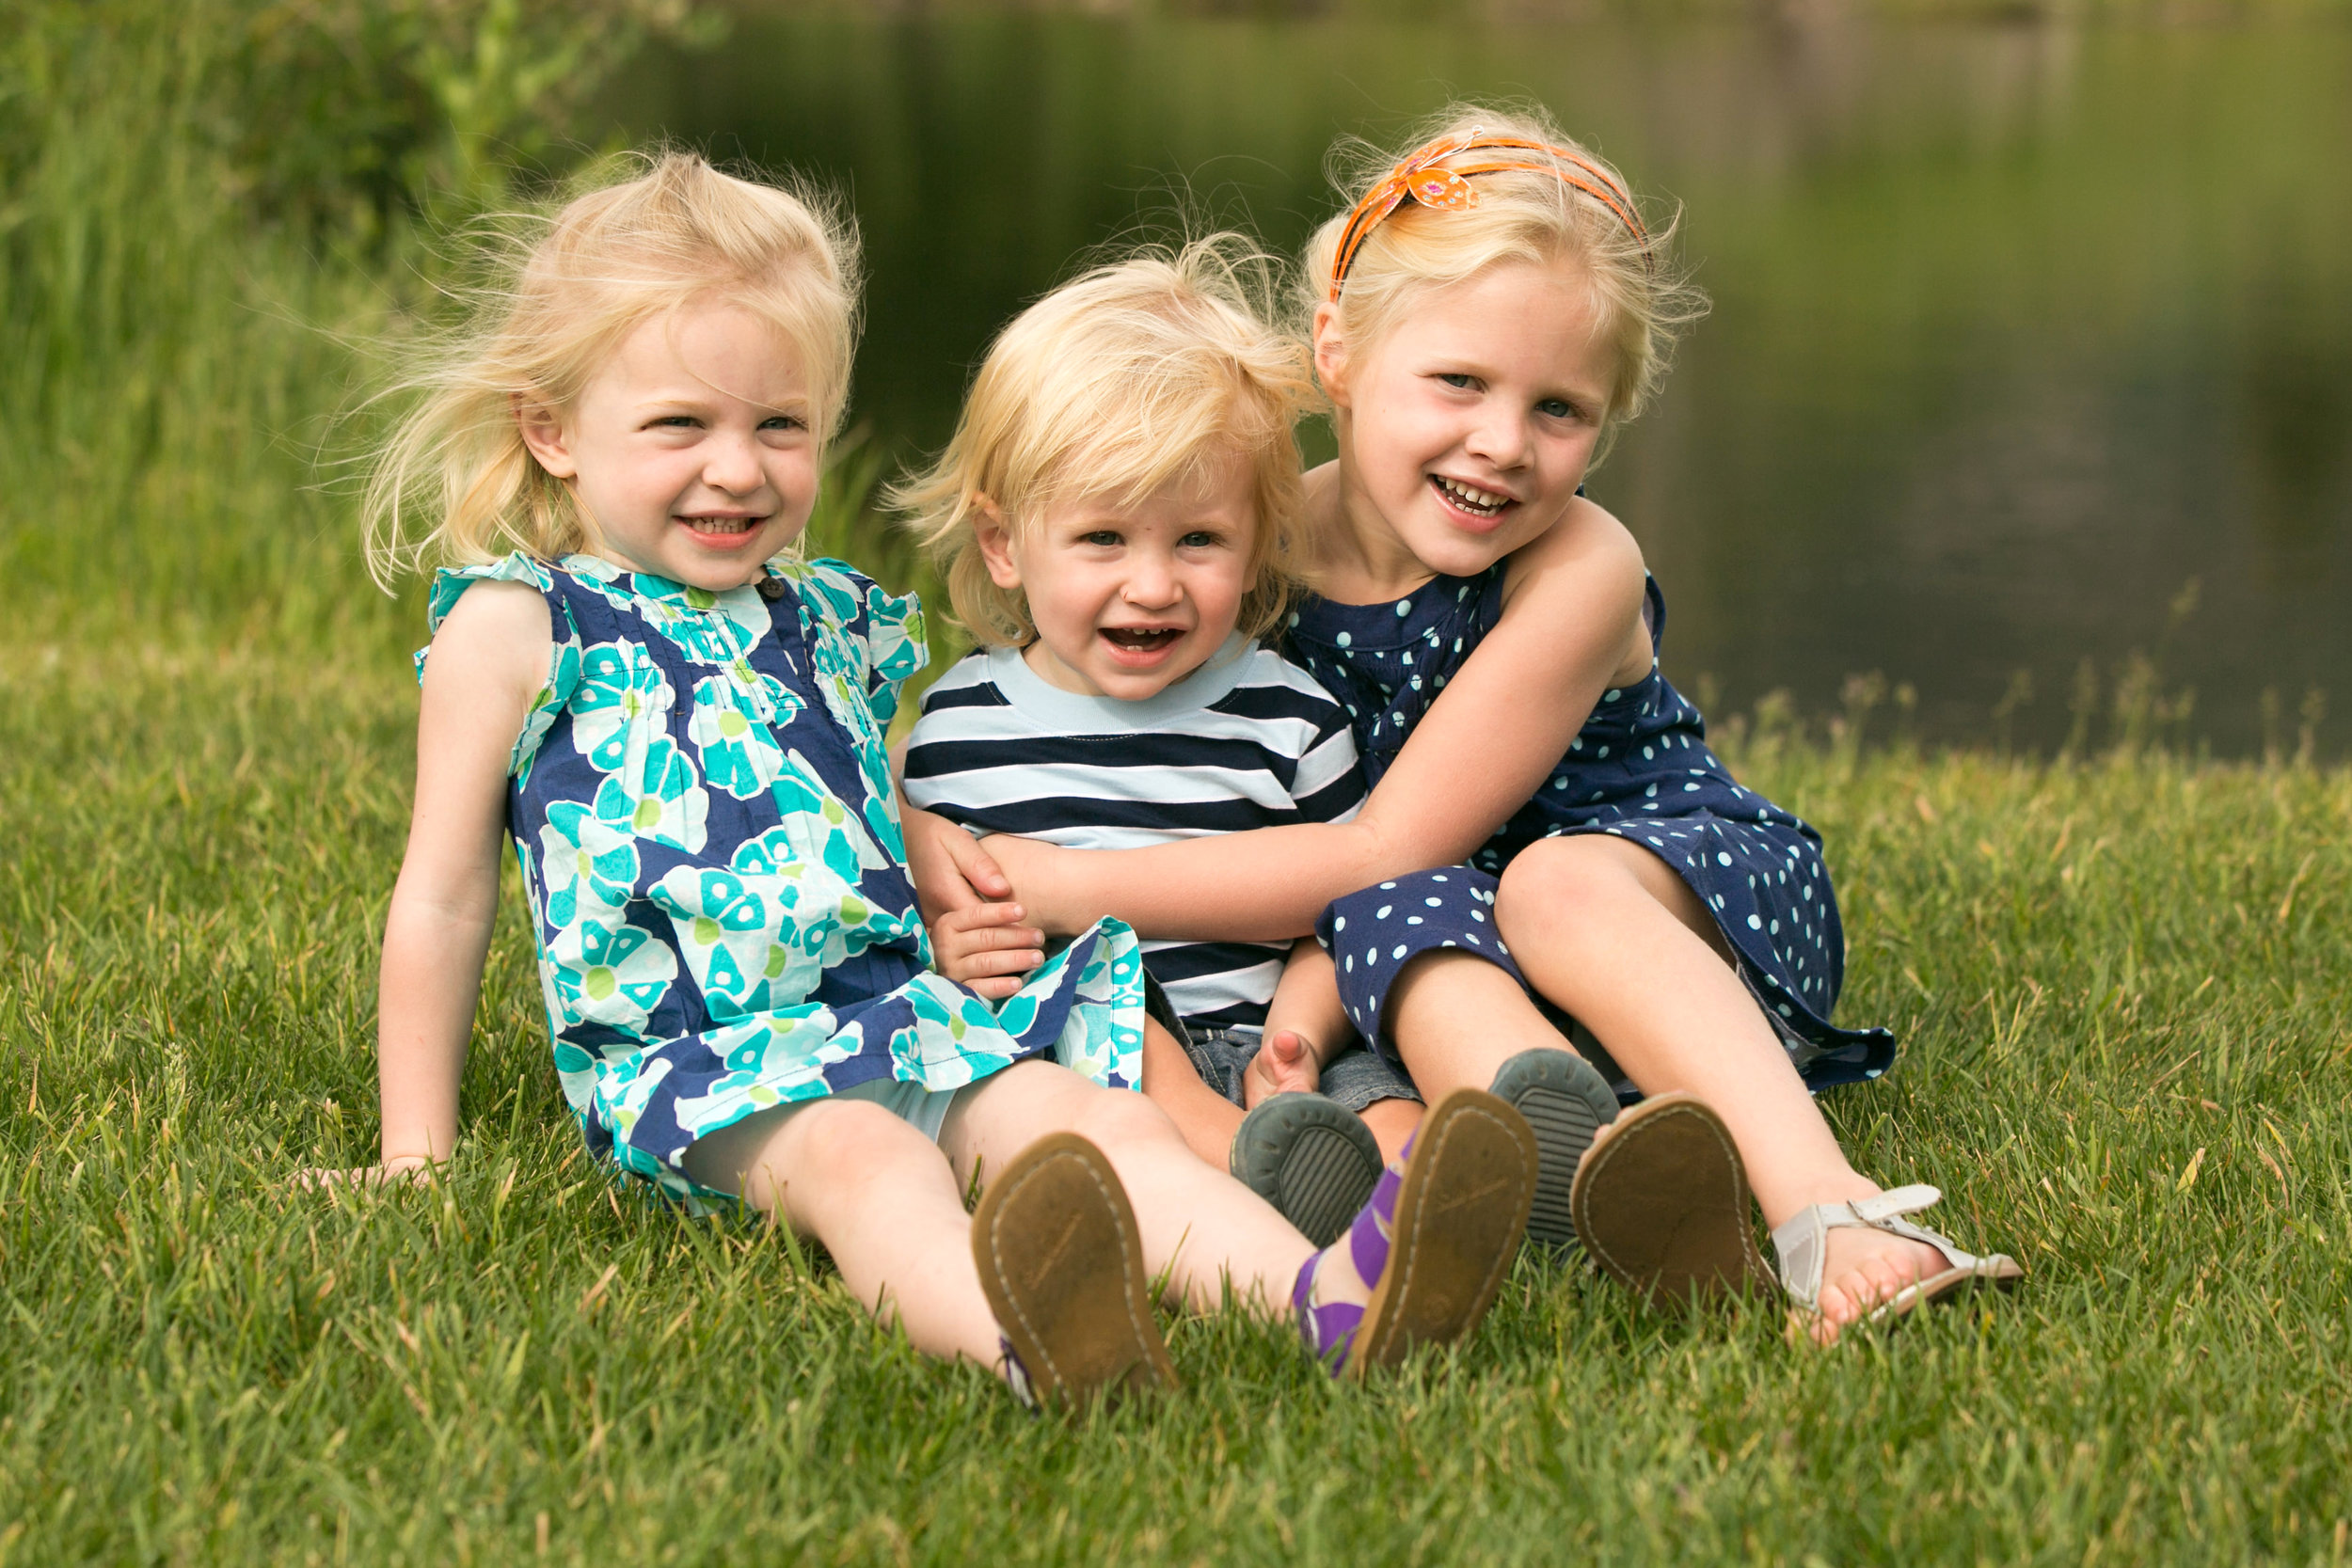 kids-portrait-photographer-colorado-Axelphoto.jpg